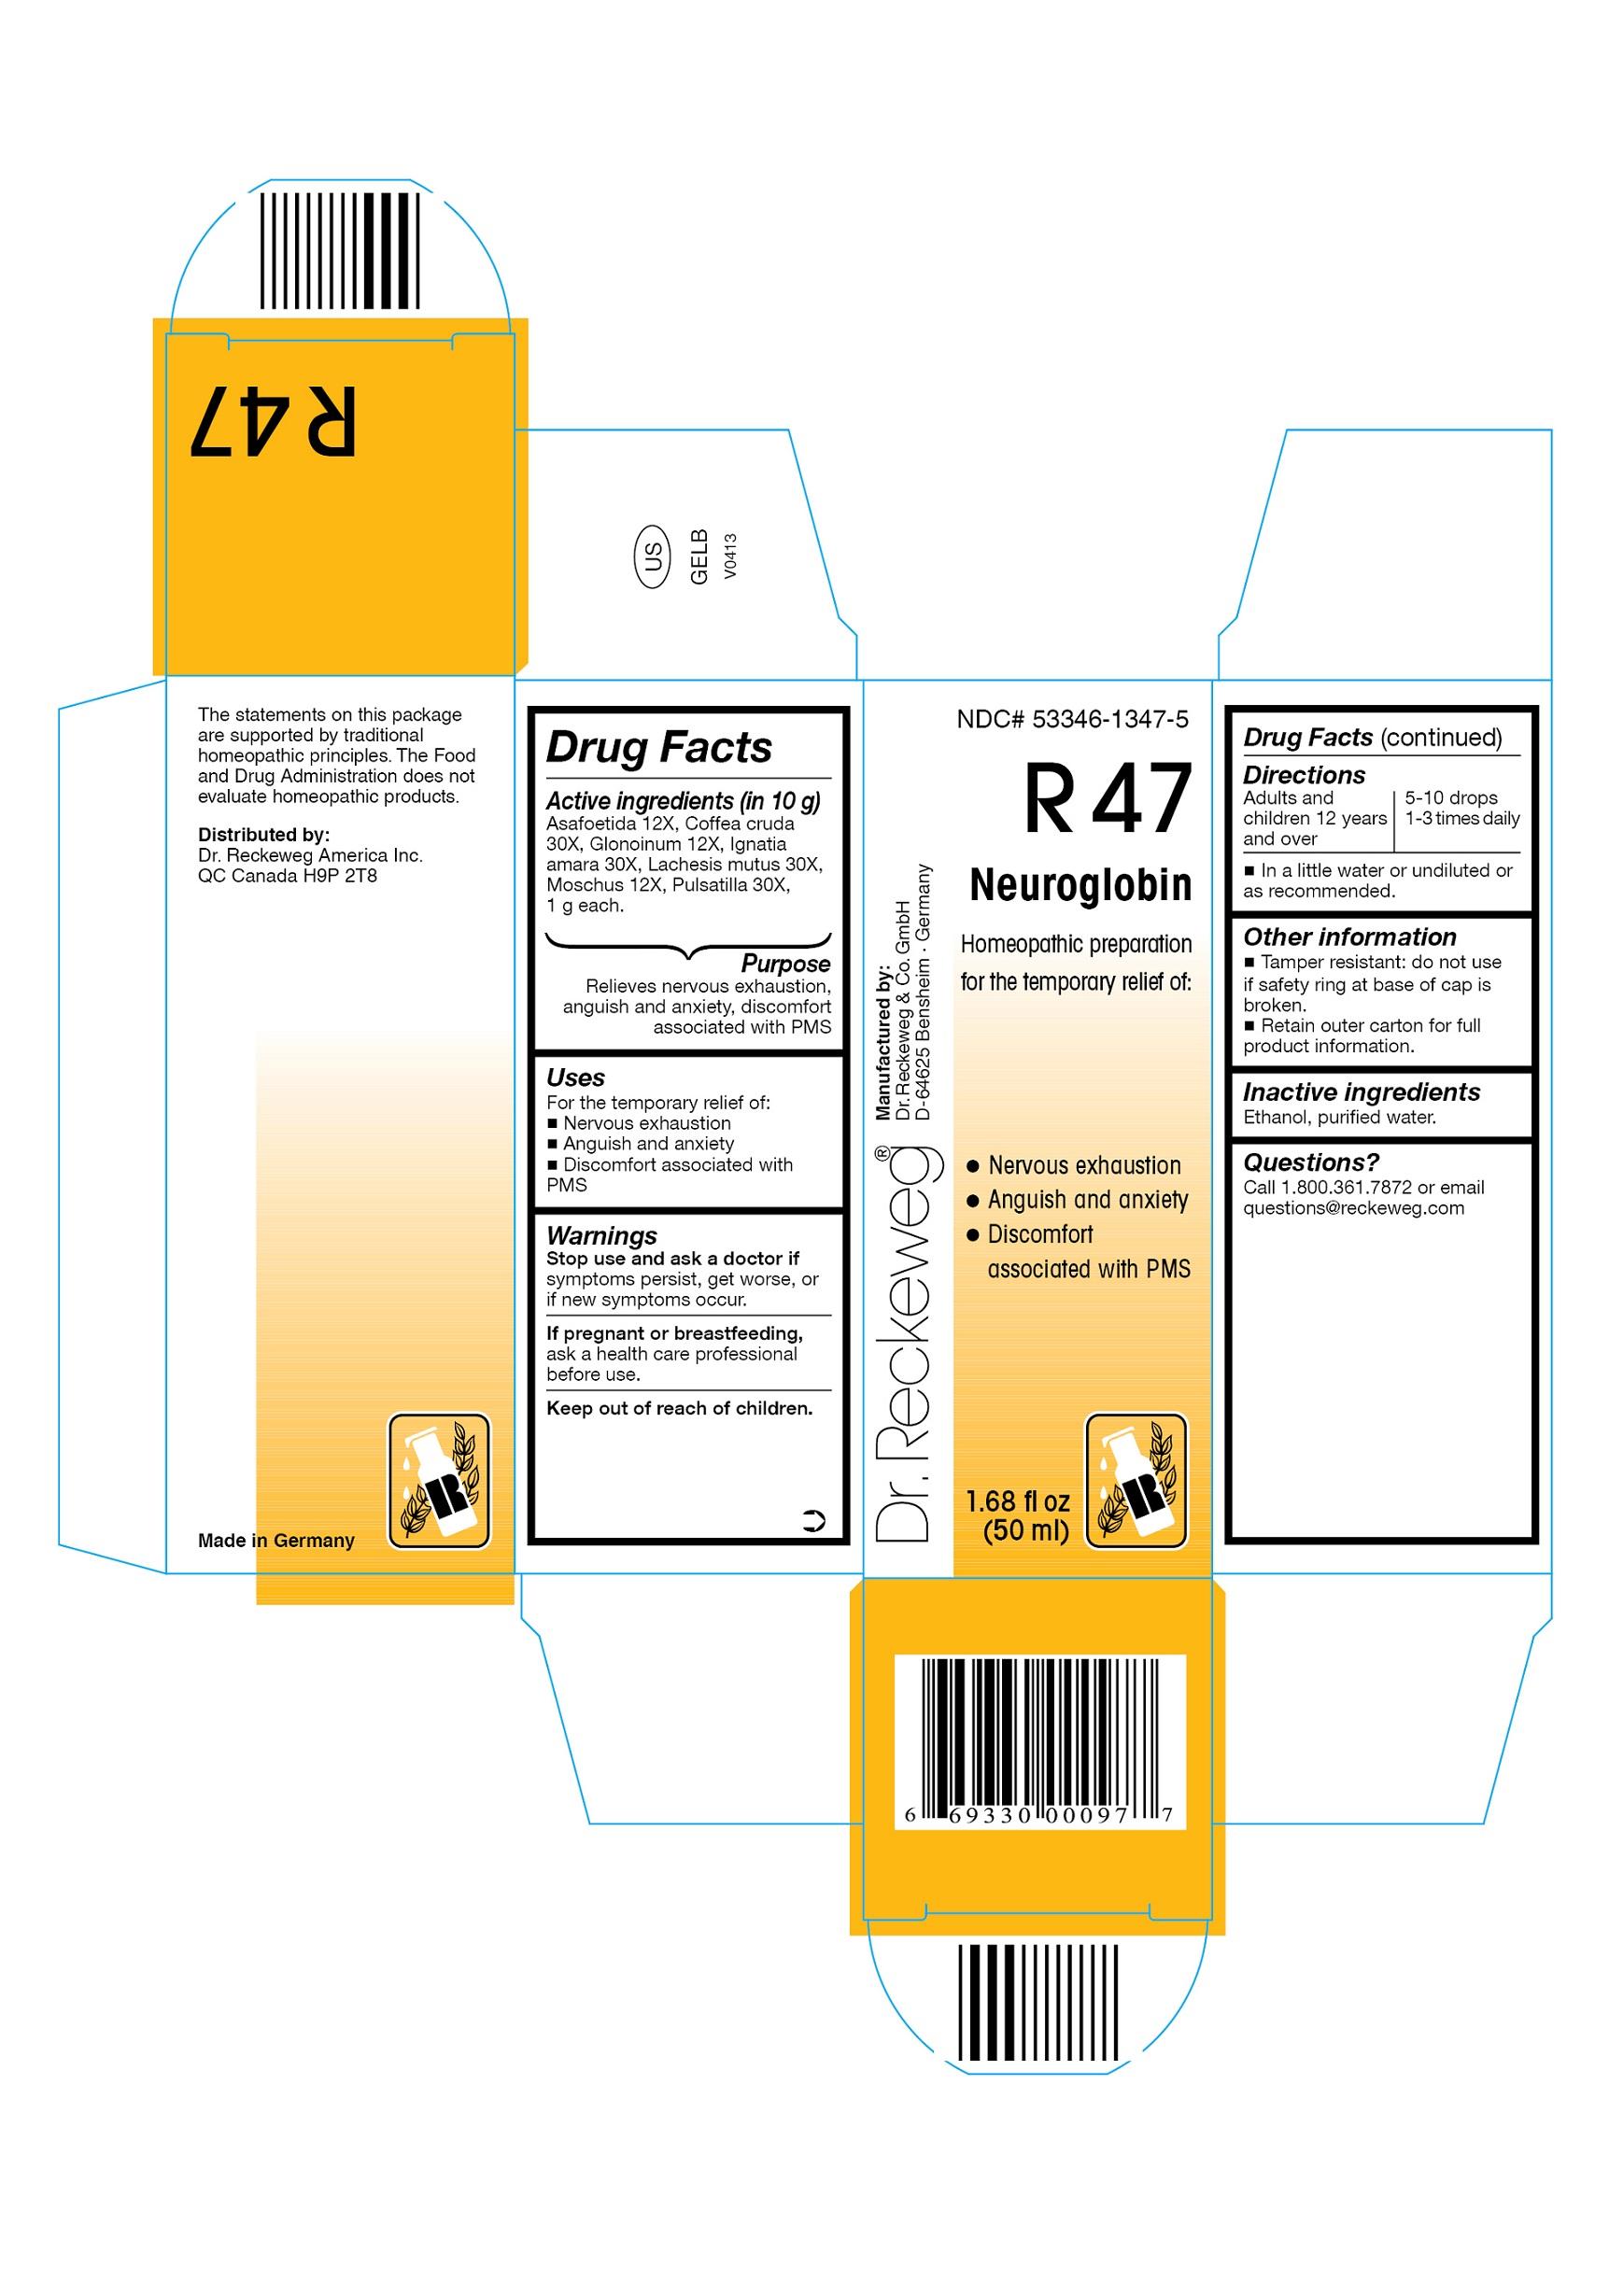 Dr. Reckeweg R47 Neuroglobin Combination Product (Asafoetida 12x, Coffea Cruda 30x, Glonoinum 12x, Ignatia Amara 30x, Lachesis Mutus 30x, Moschus 12x, Pulsatilla 30x) Liquid [Pharmazeutische Fabrik Dr. Reckeweg & Co]